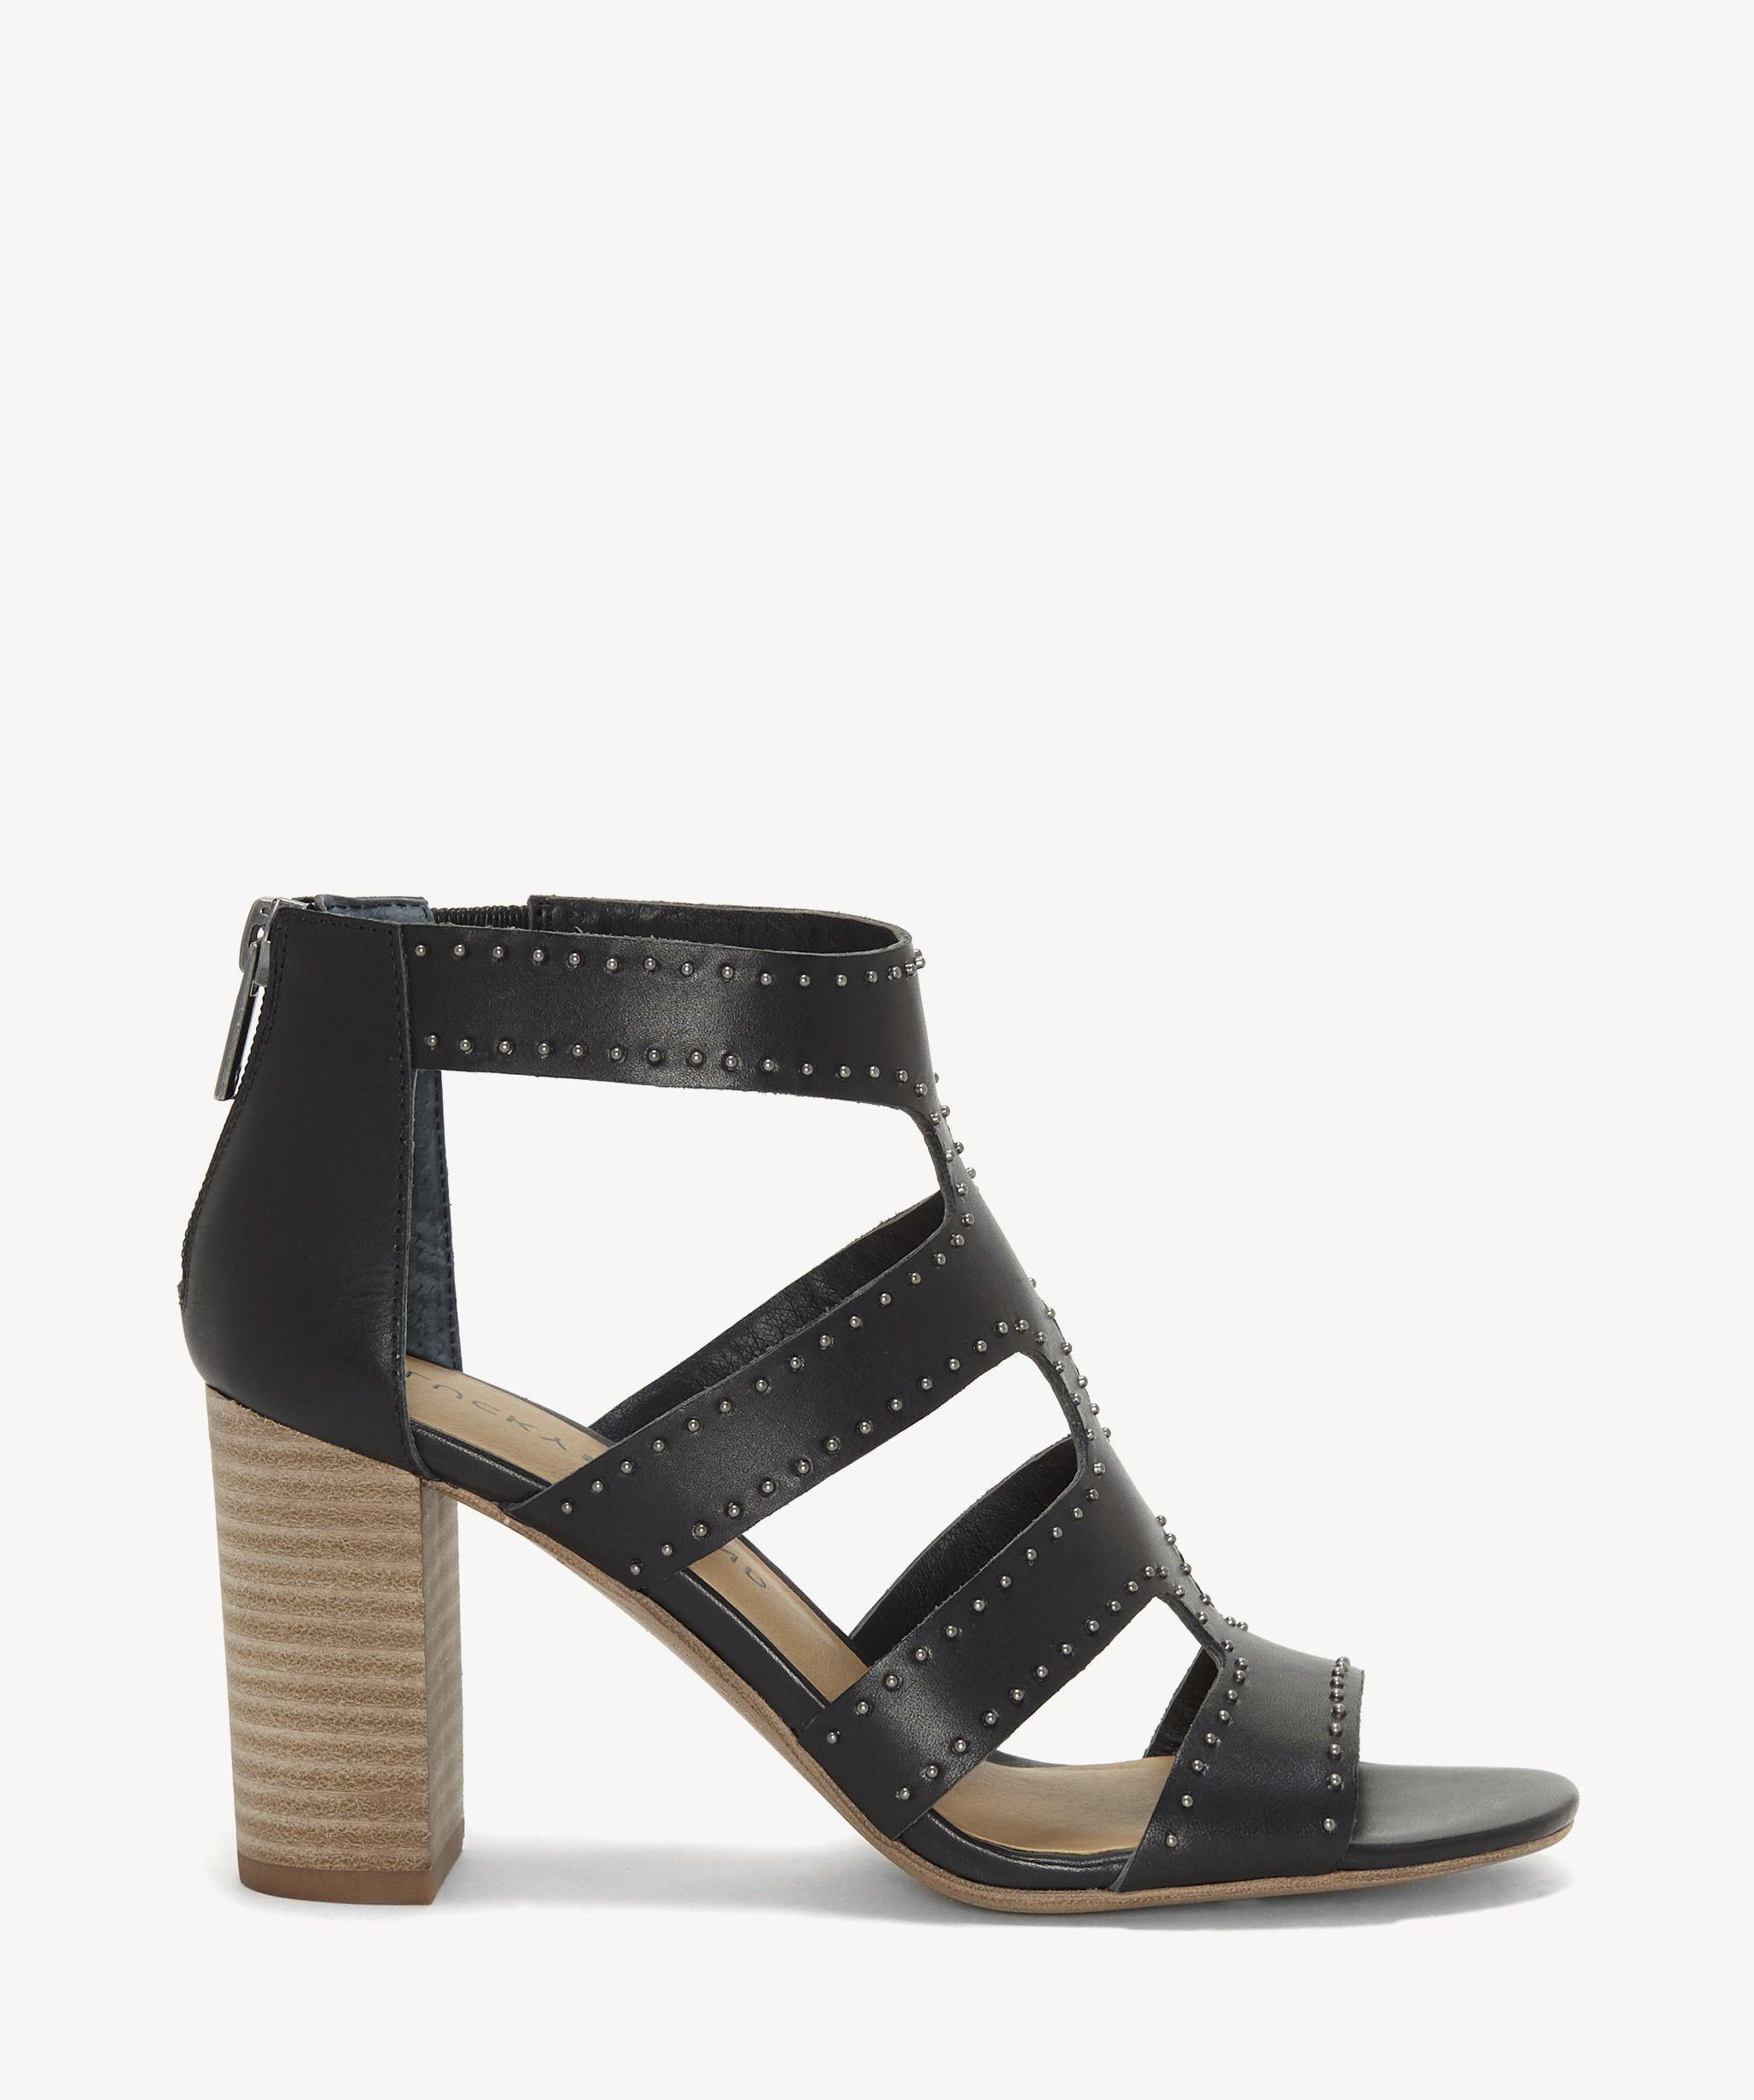 76454d5b3503 Sole Society Tahira Block Heel Sandal